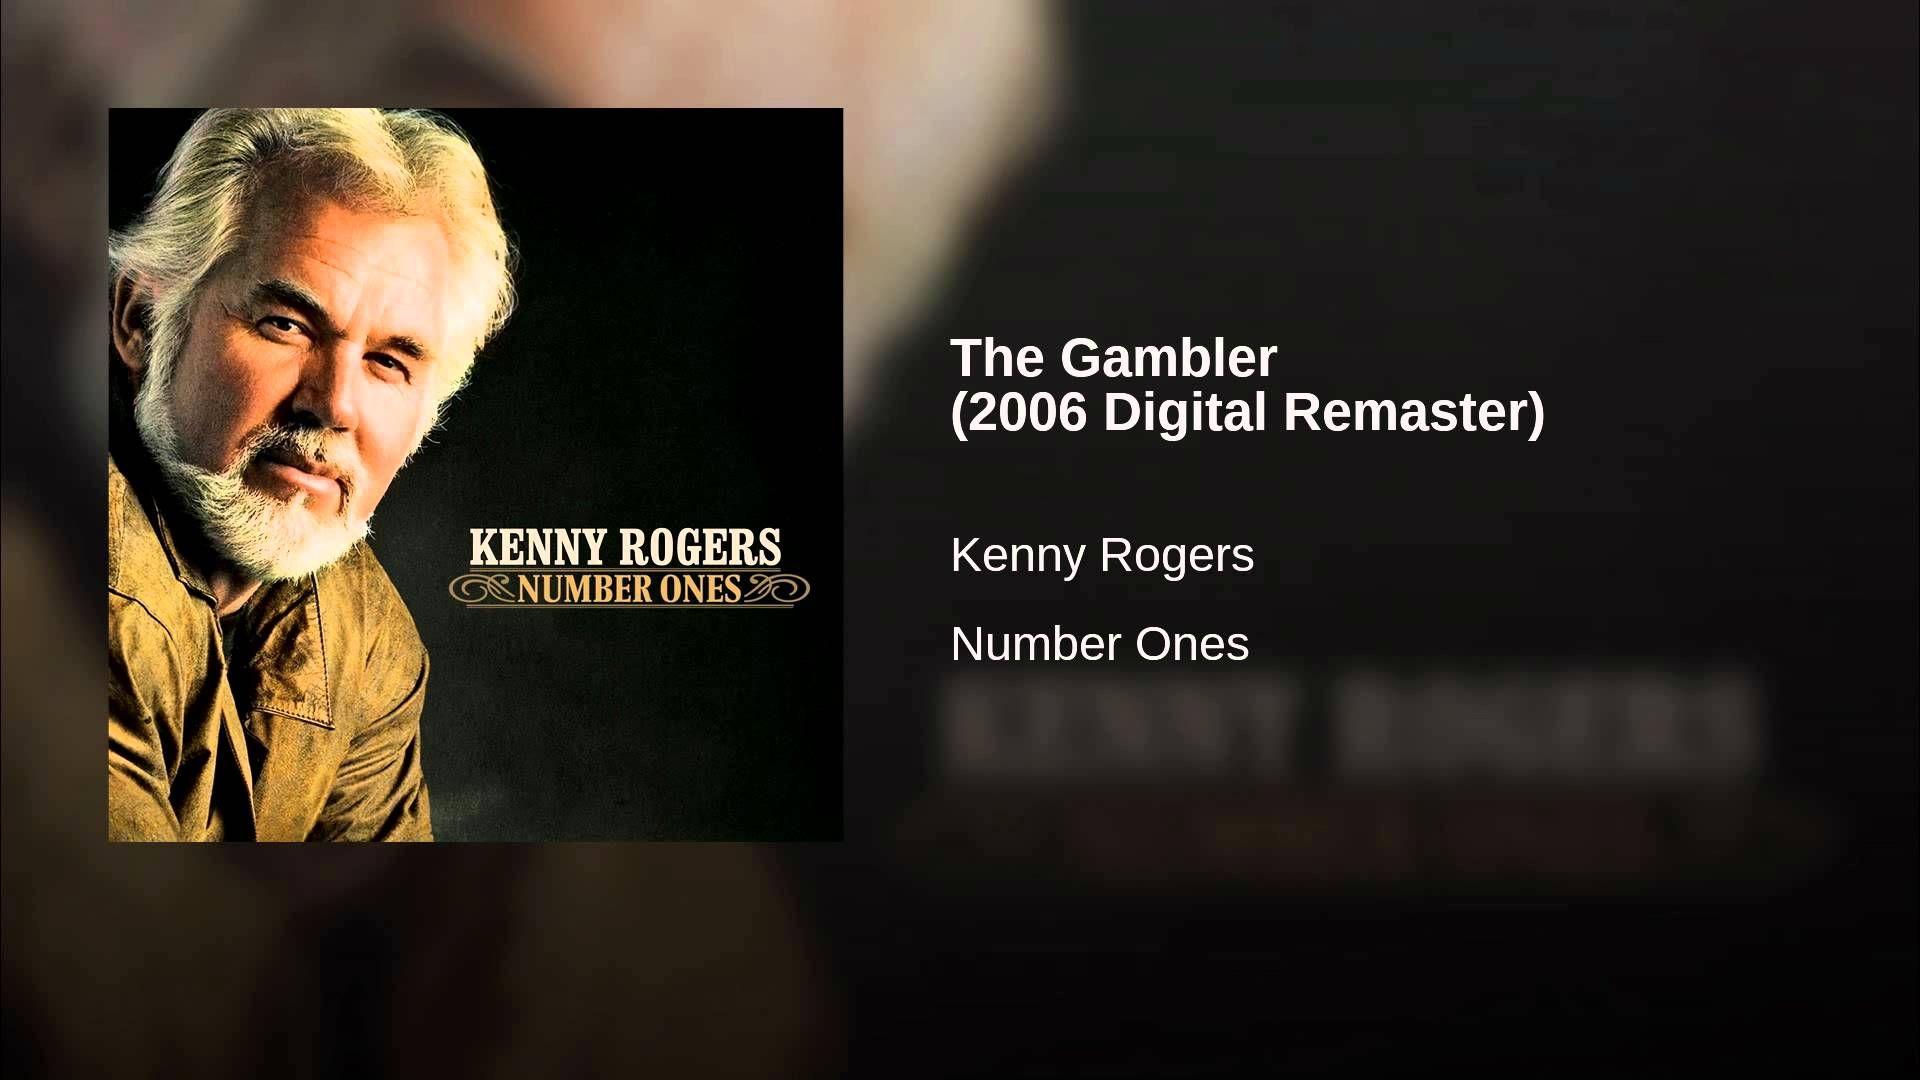 The Gambler (2006 Digital Remaster) Celebrating Kenny